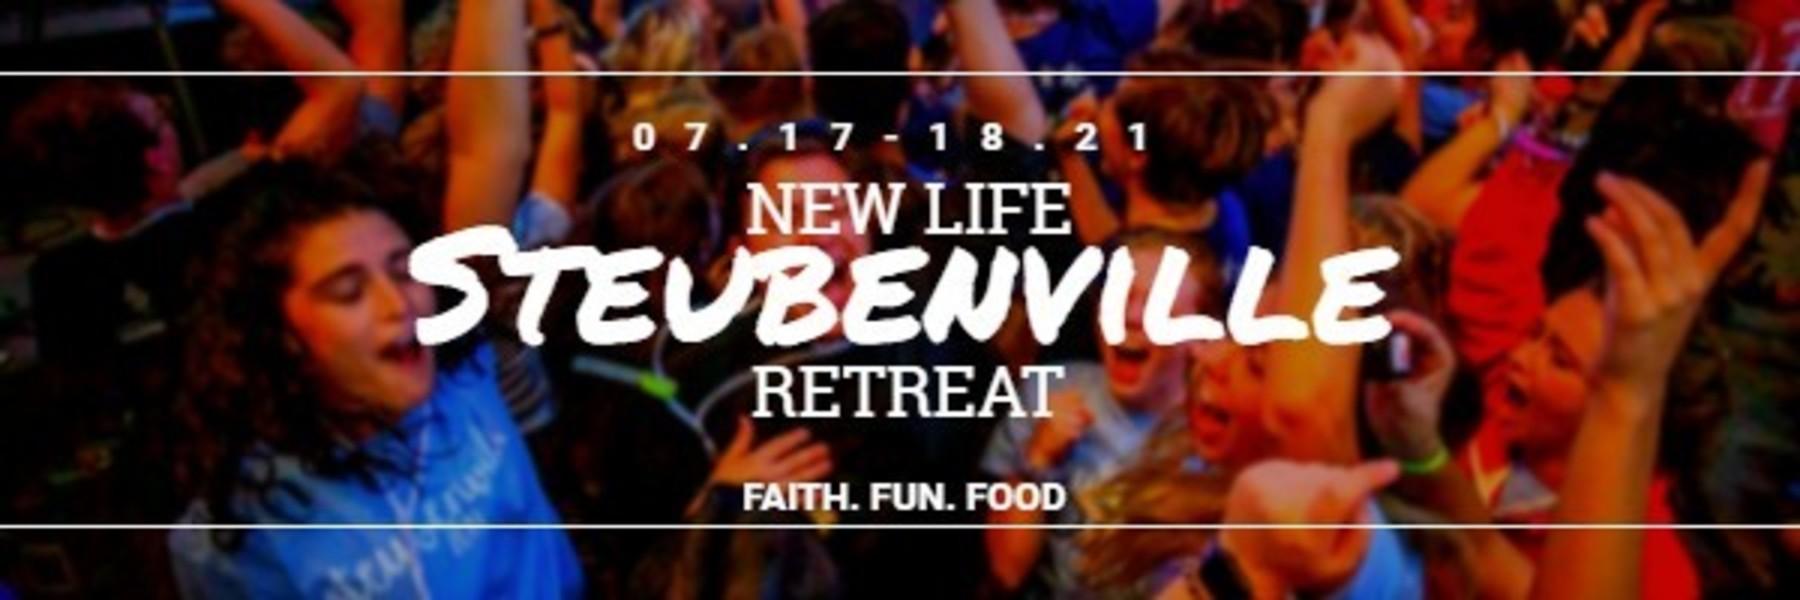 Steubenville New Life Retreat Upcoming Rev